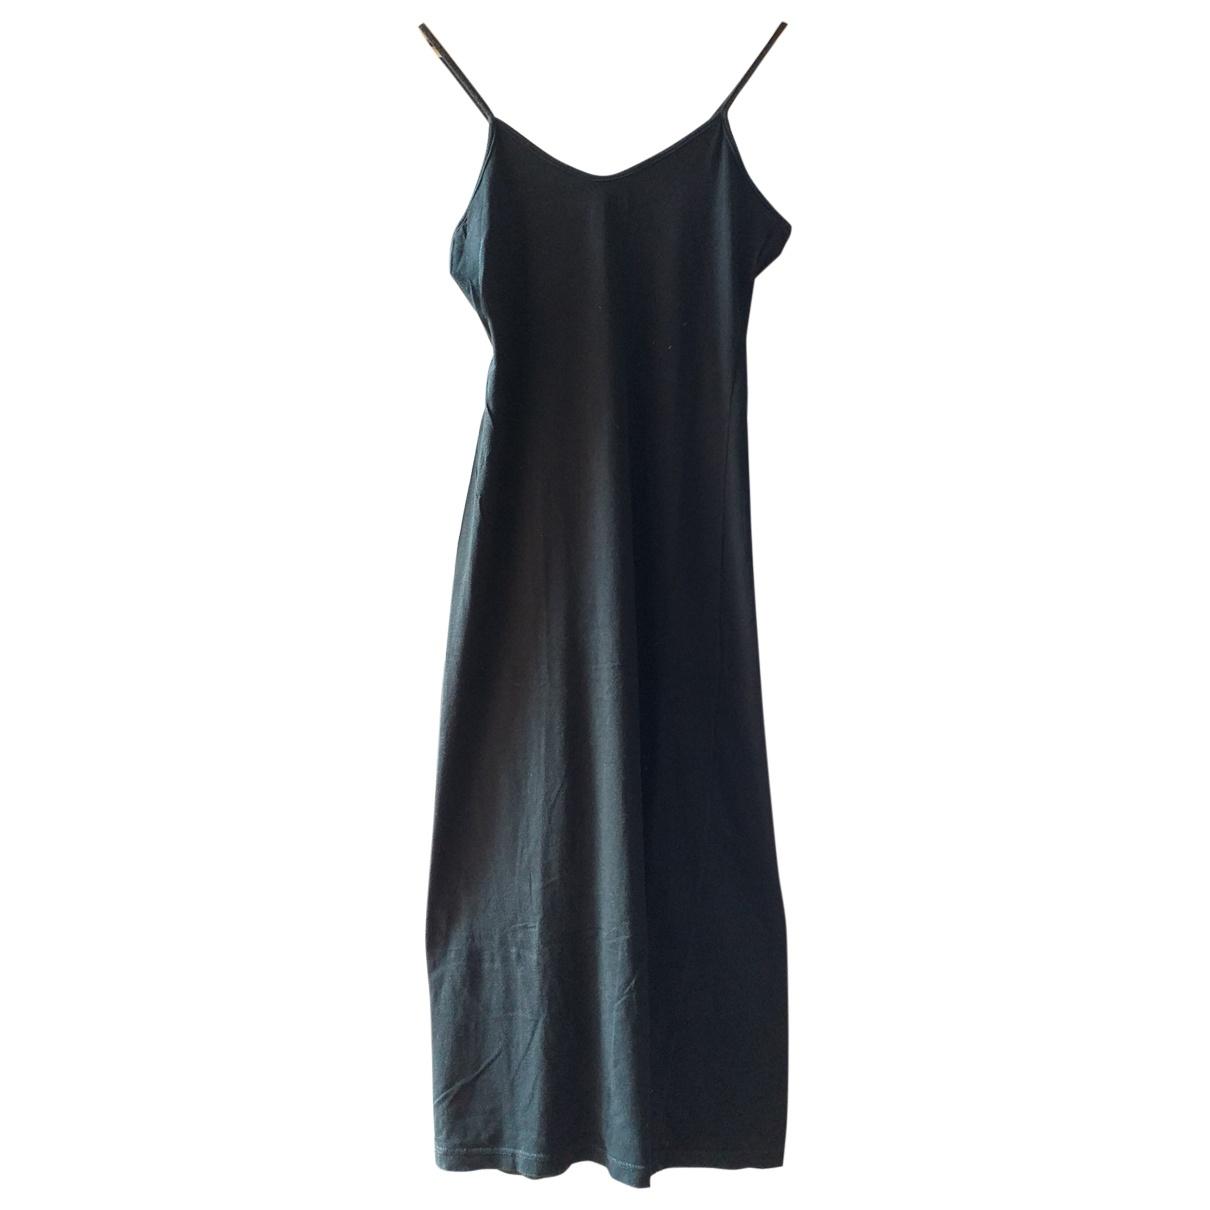 Irie \N Kleid in  Schwarz Baumwolle